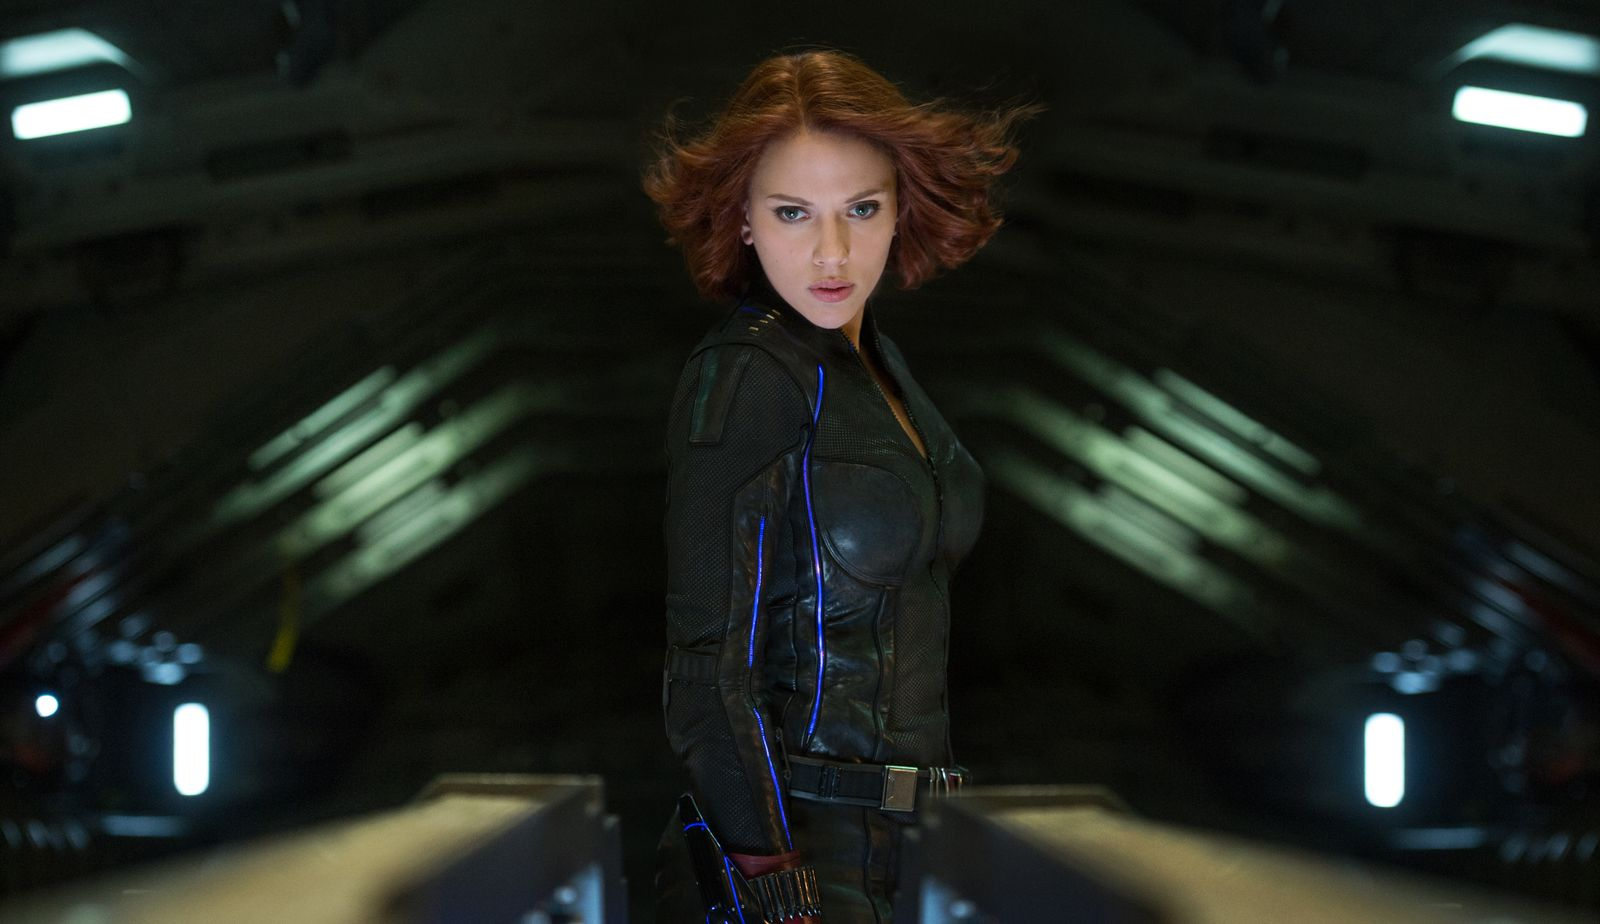 EINMALIGE VERWENDUNG Film/ Avengers: Age of Ultron VID